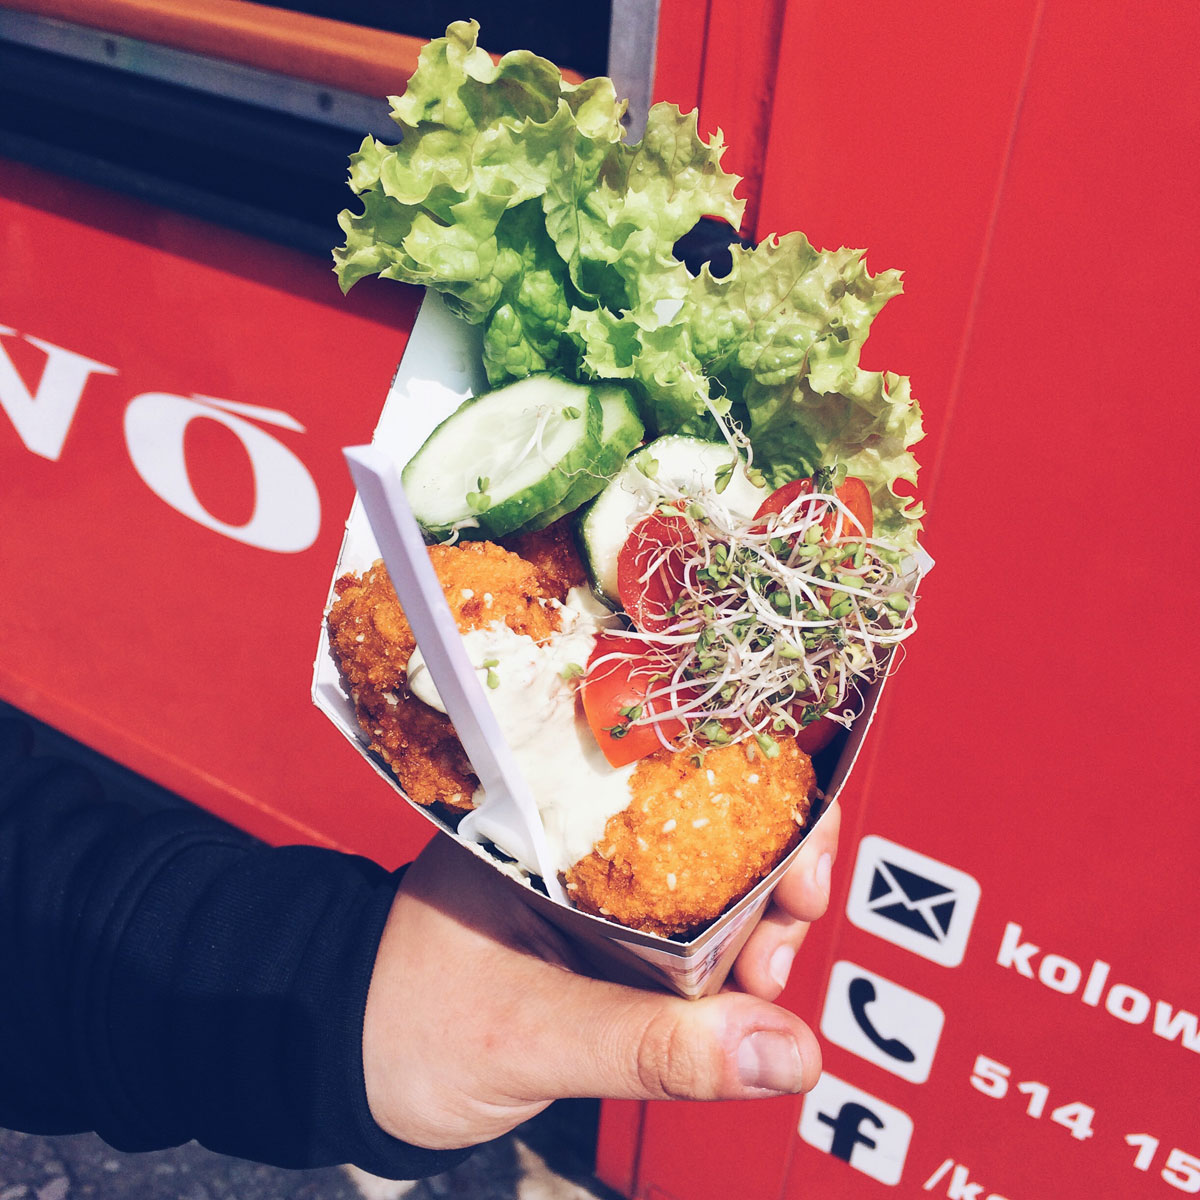 Food truck Kołowóz i ich ser kulla.